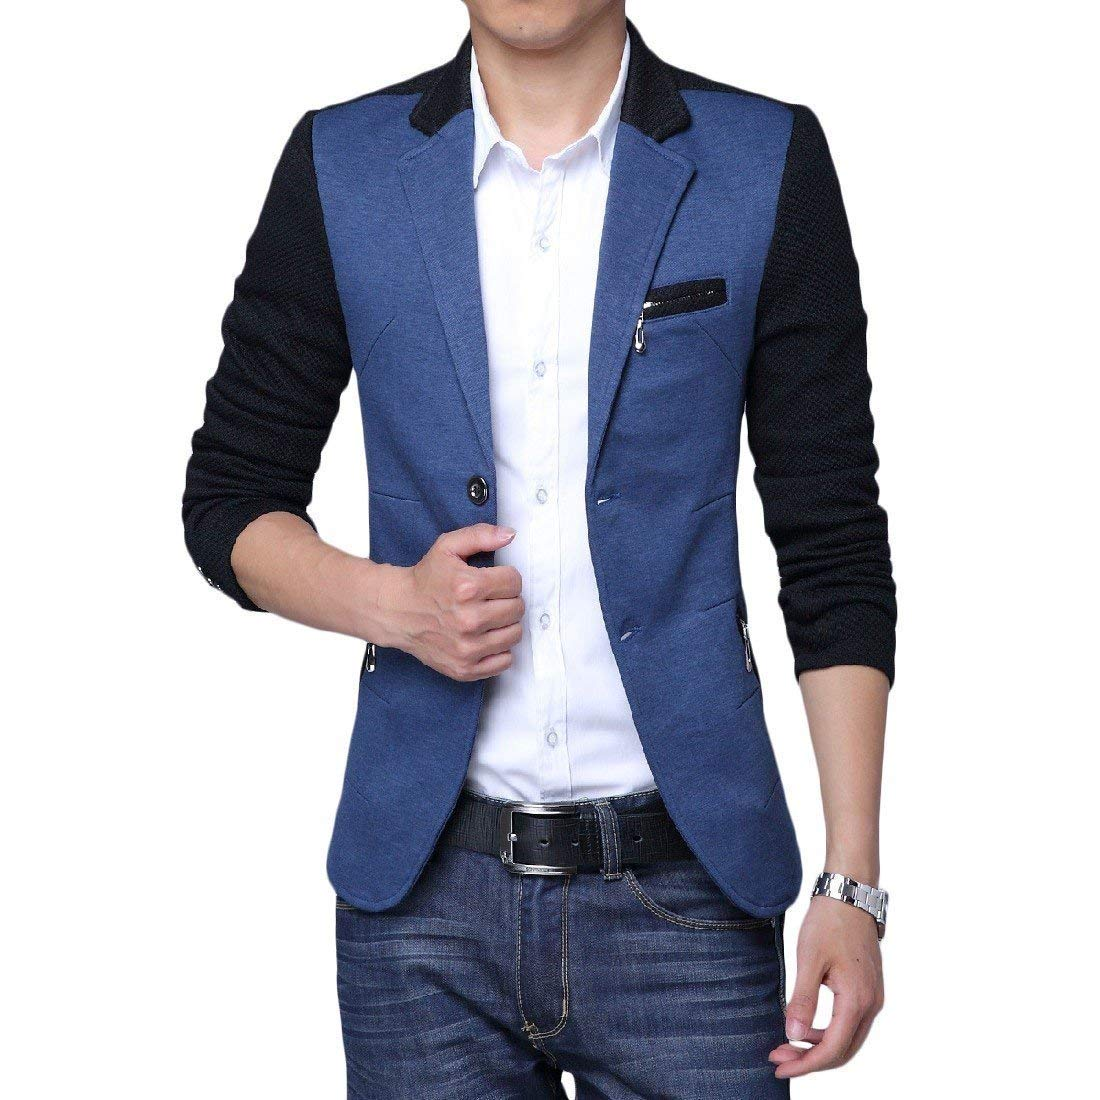 Blazer da Uomo Slim Blazer 1 Fit Blazer Casual Moderna Button Suit Giacche Primavera Business Basic Risvolto Casual da Uomo Casual Blazer da Uomo Elegante None